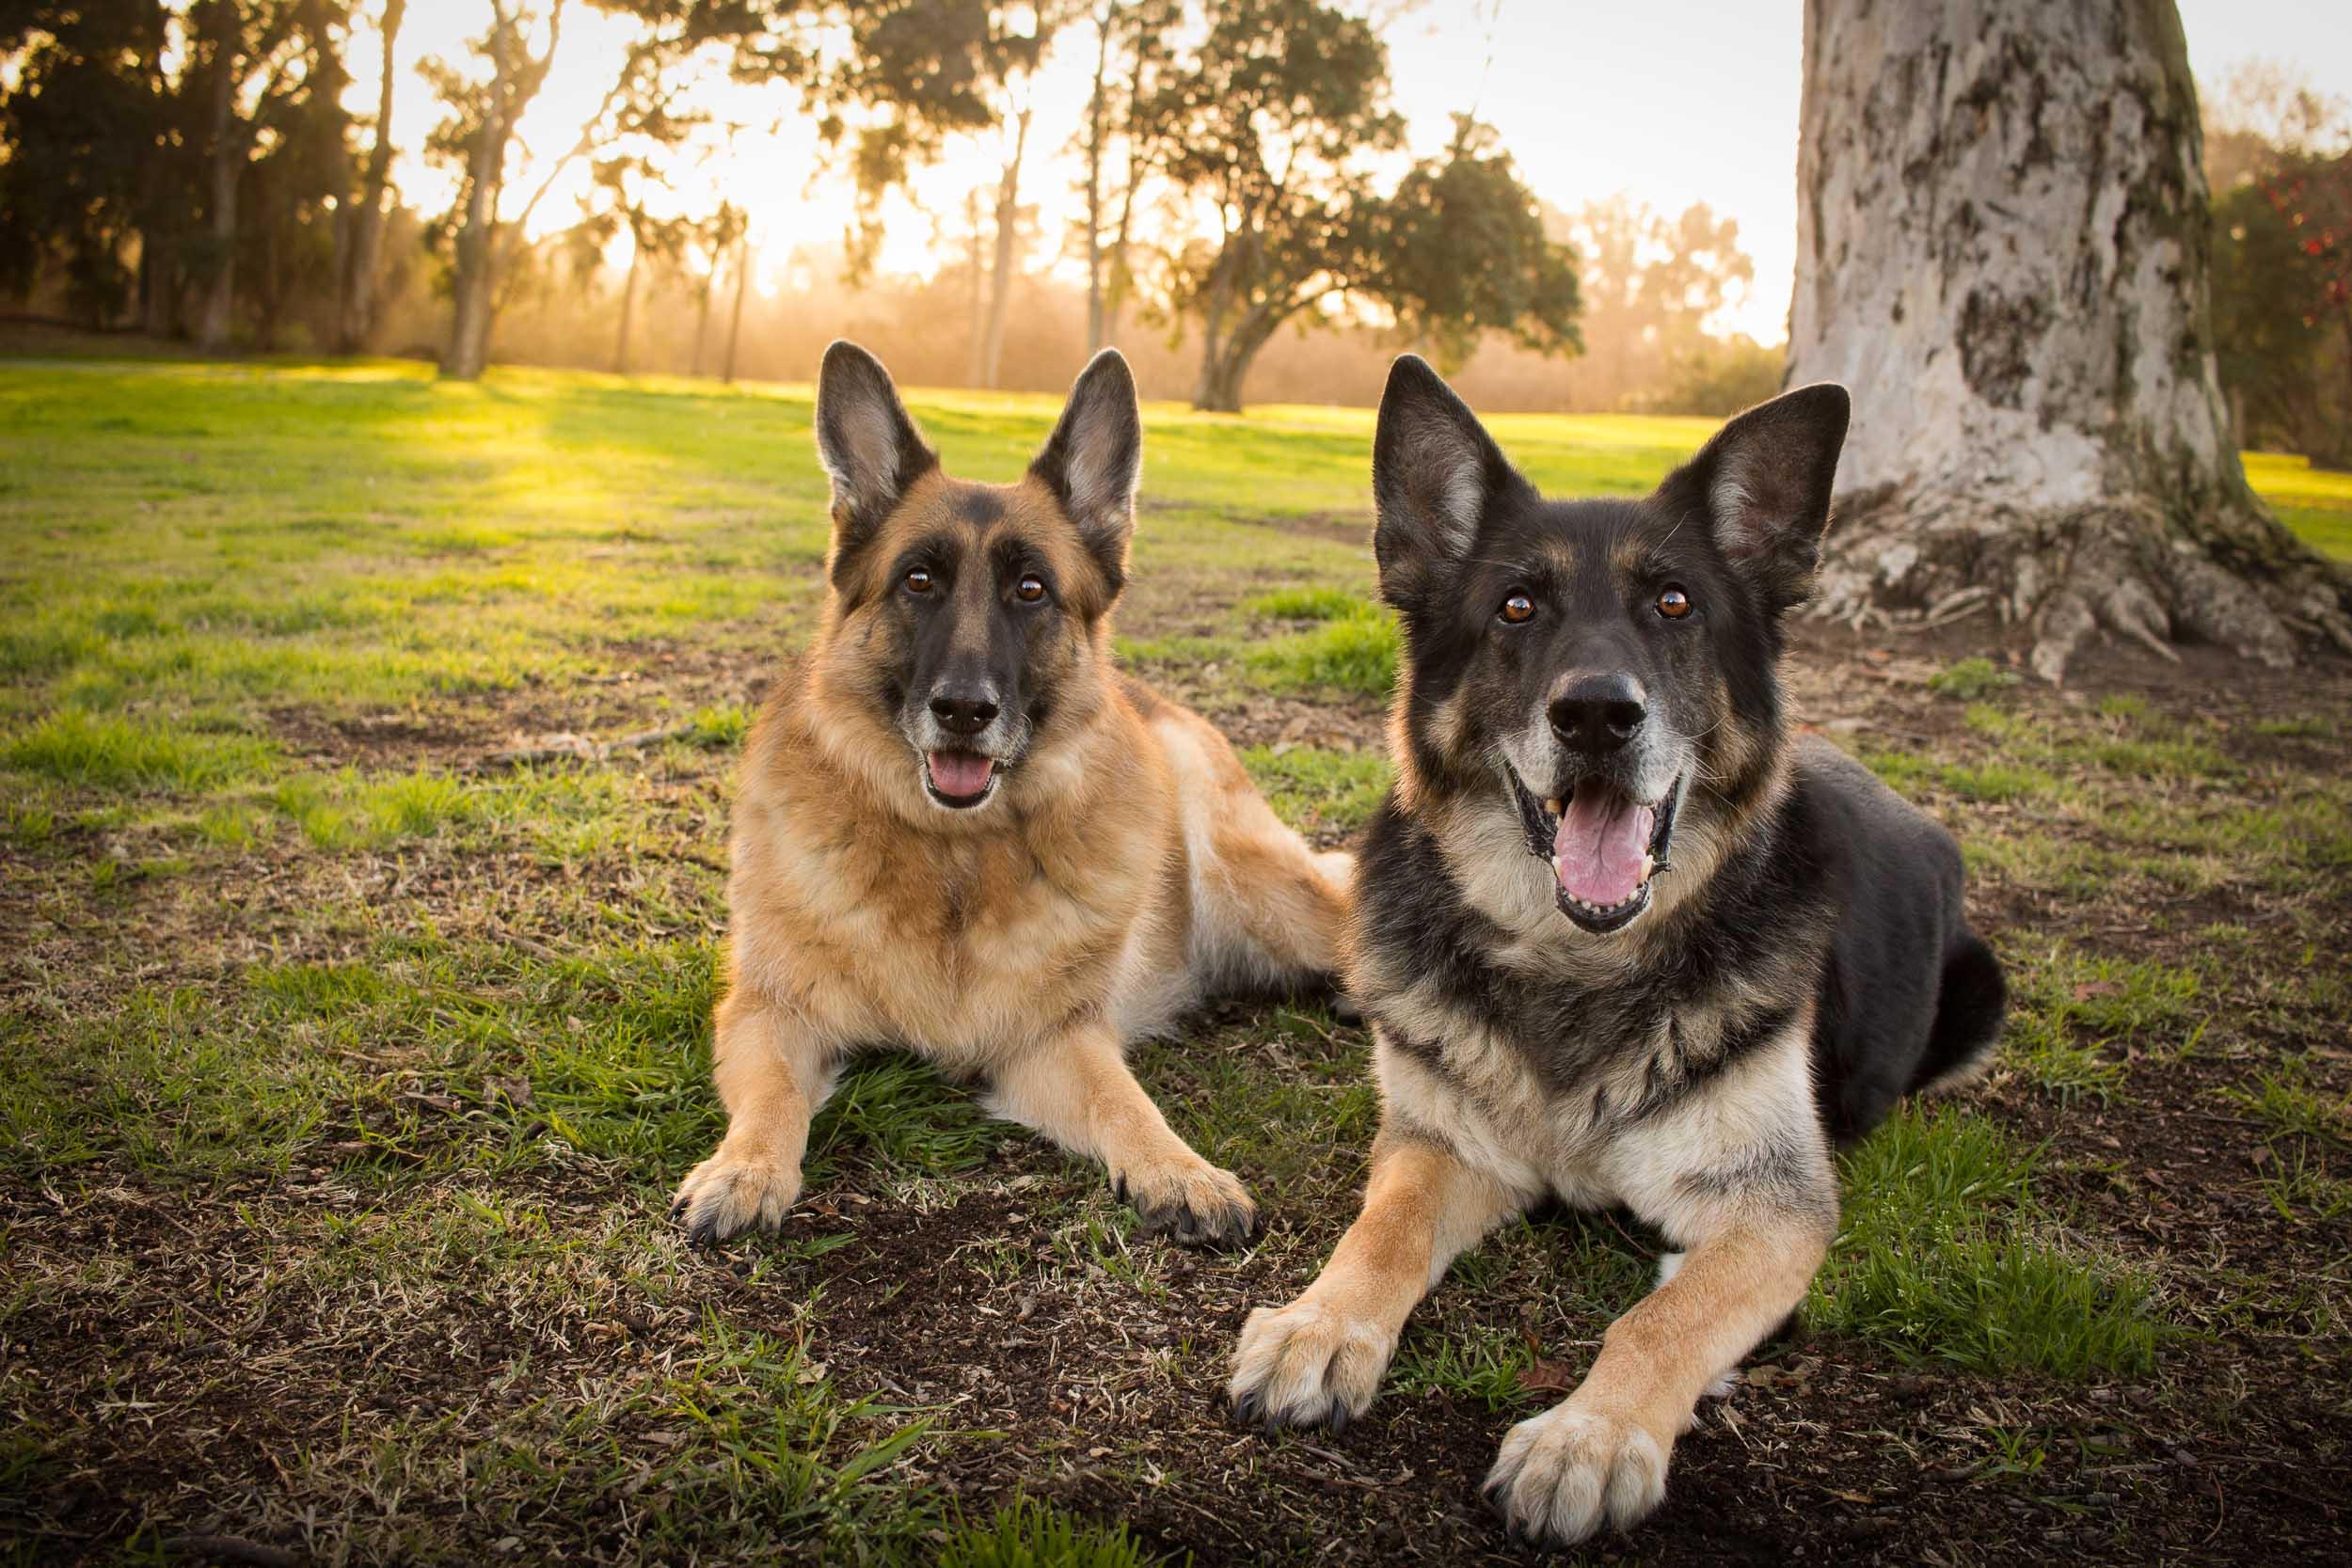 06-Orange-County-Dog-Photographer-Southern-California-Steamer-Lee.JPG